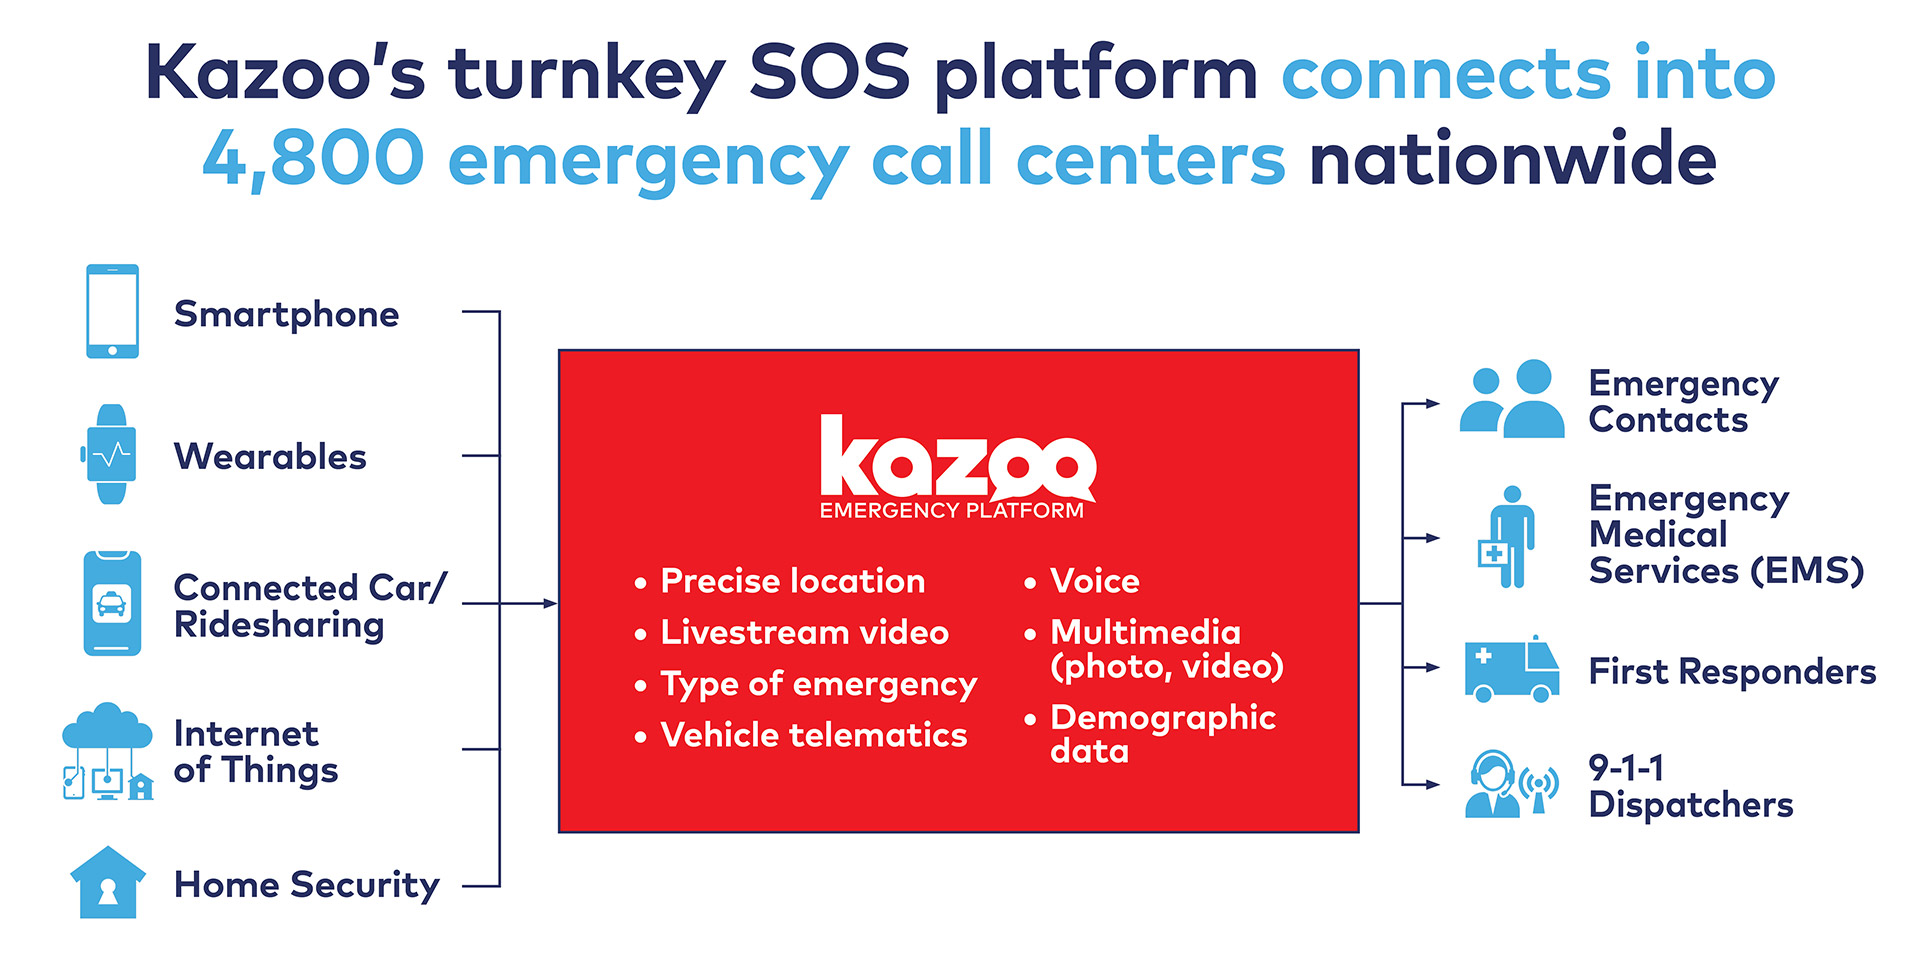 kazoo emergency platform